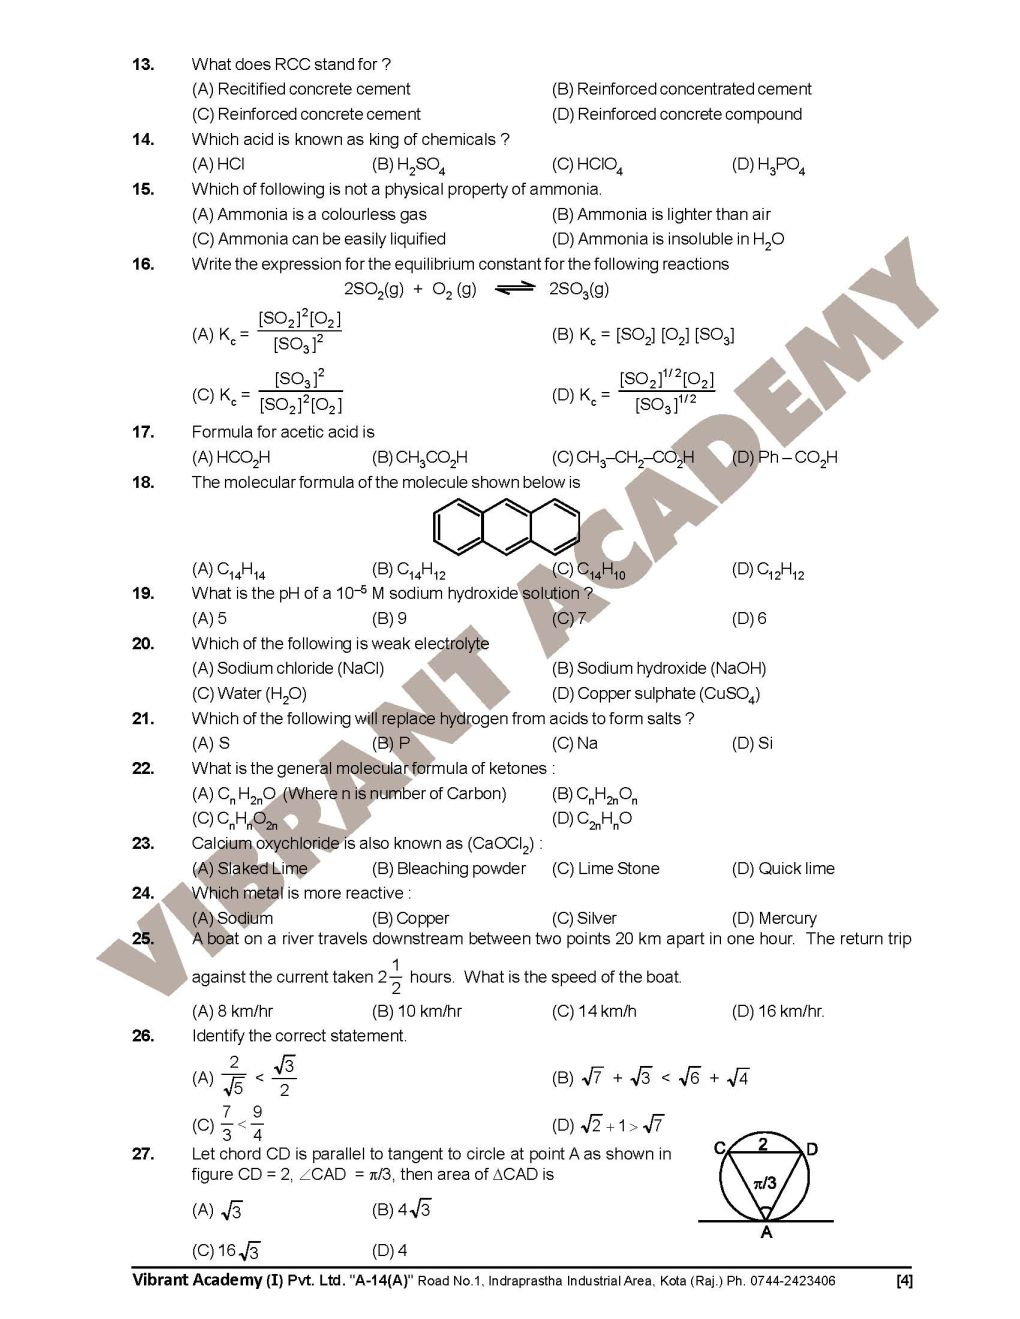 sol technical question paper